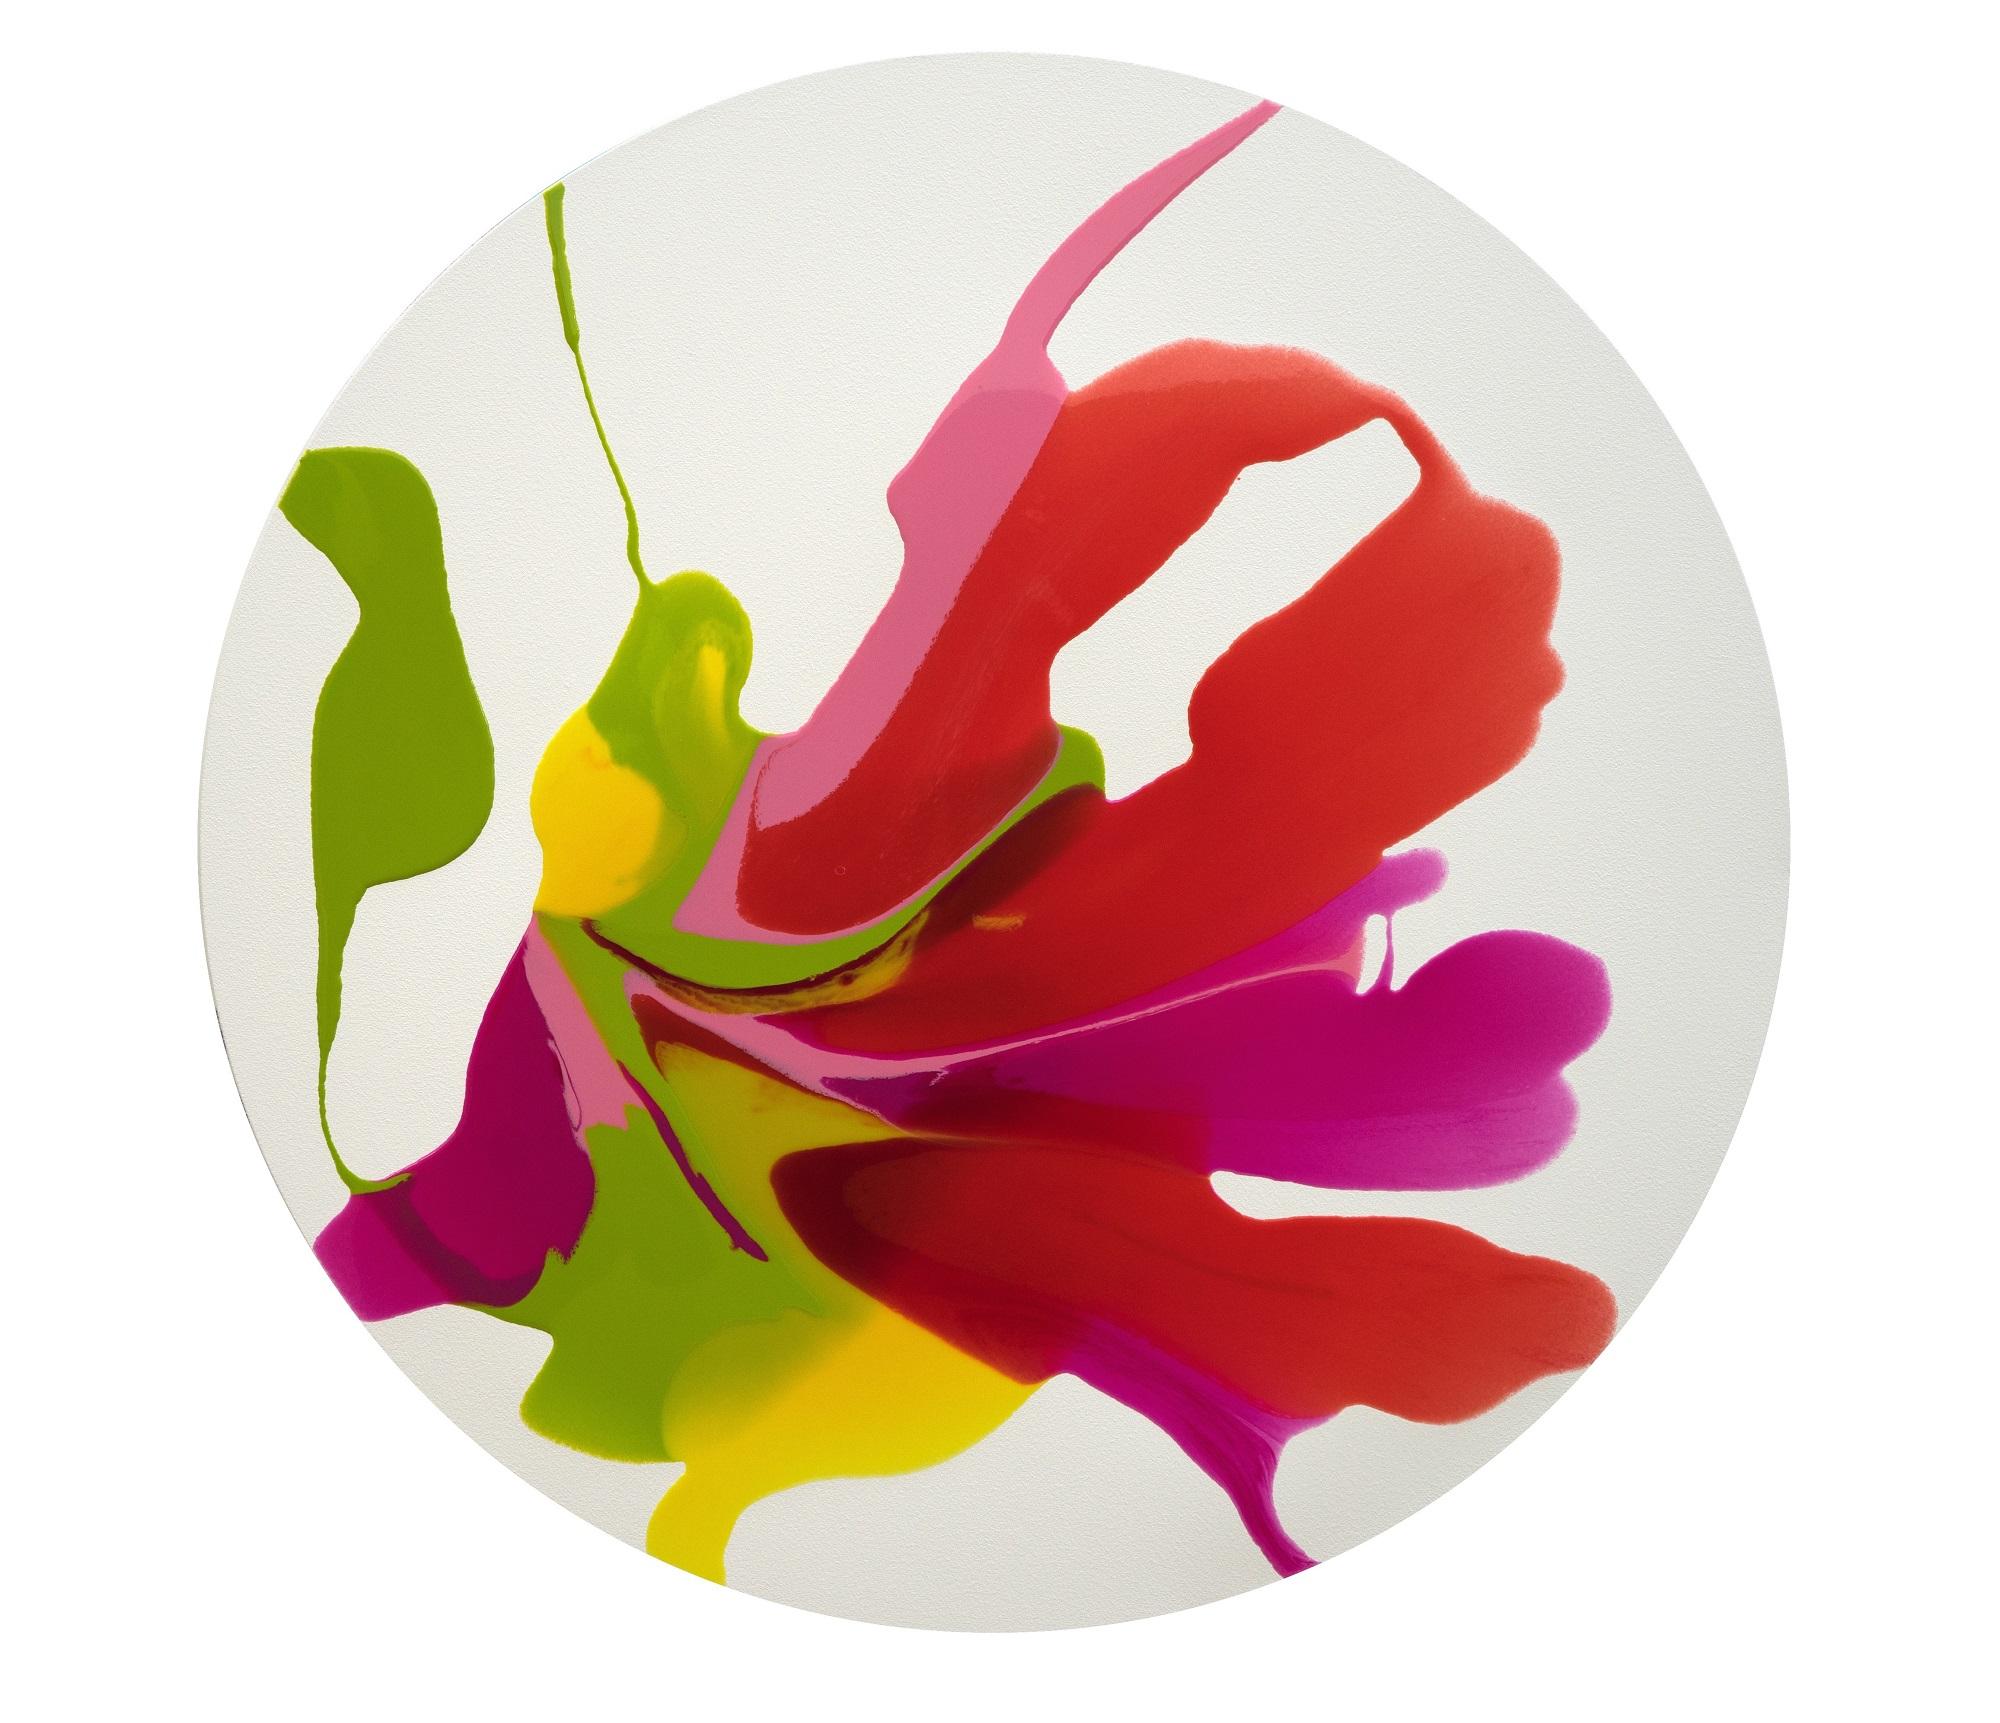 'Flounce' Orlanda Broom Resin on canvas, 100cm diameter, 2017